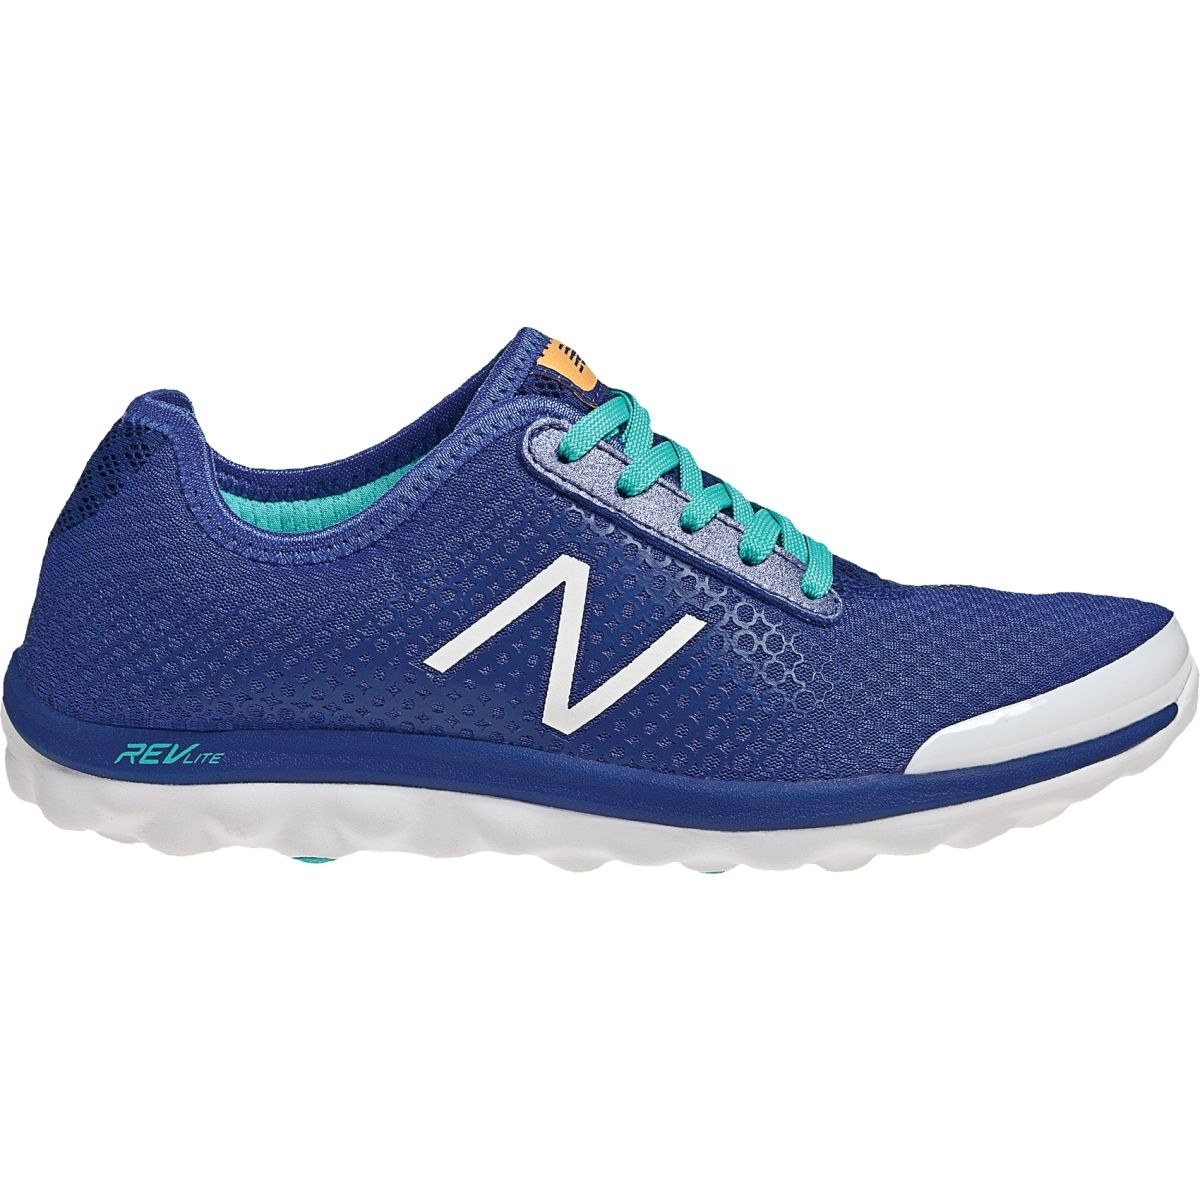 8af1f5372e1f New Balance WW895 D Width Wide Walking Shoes Womens - SportChek.ca  dental   poker